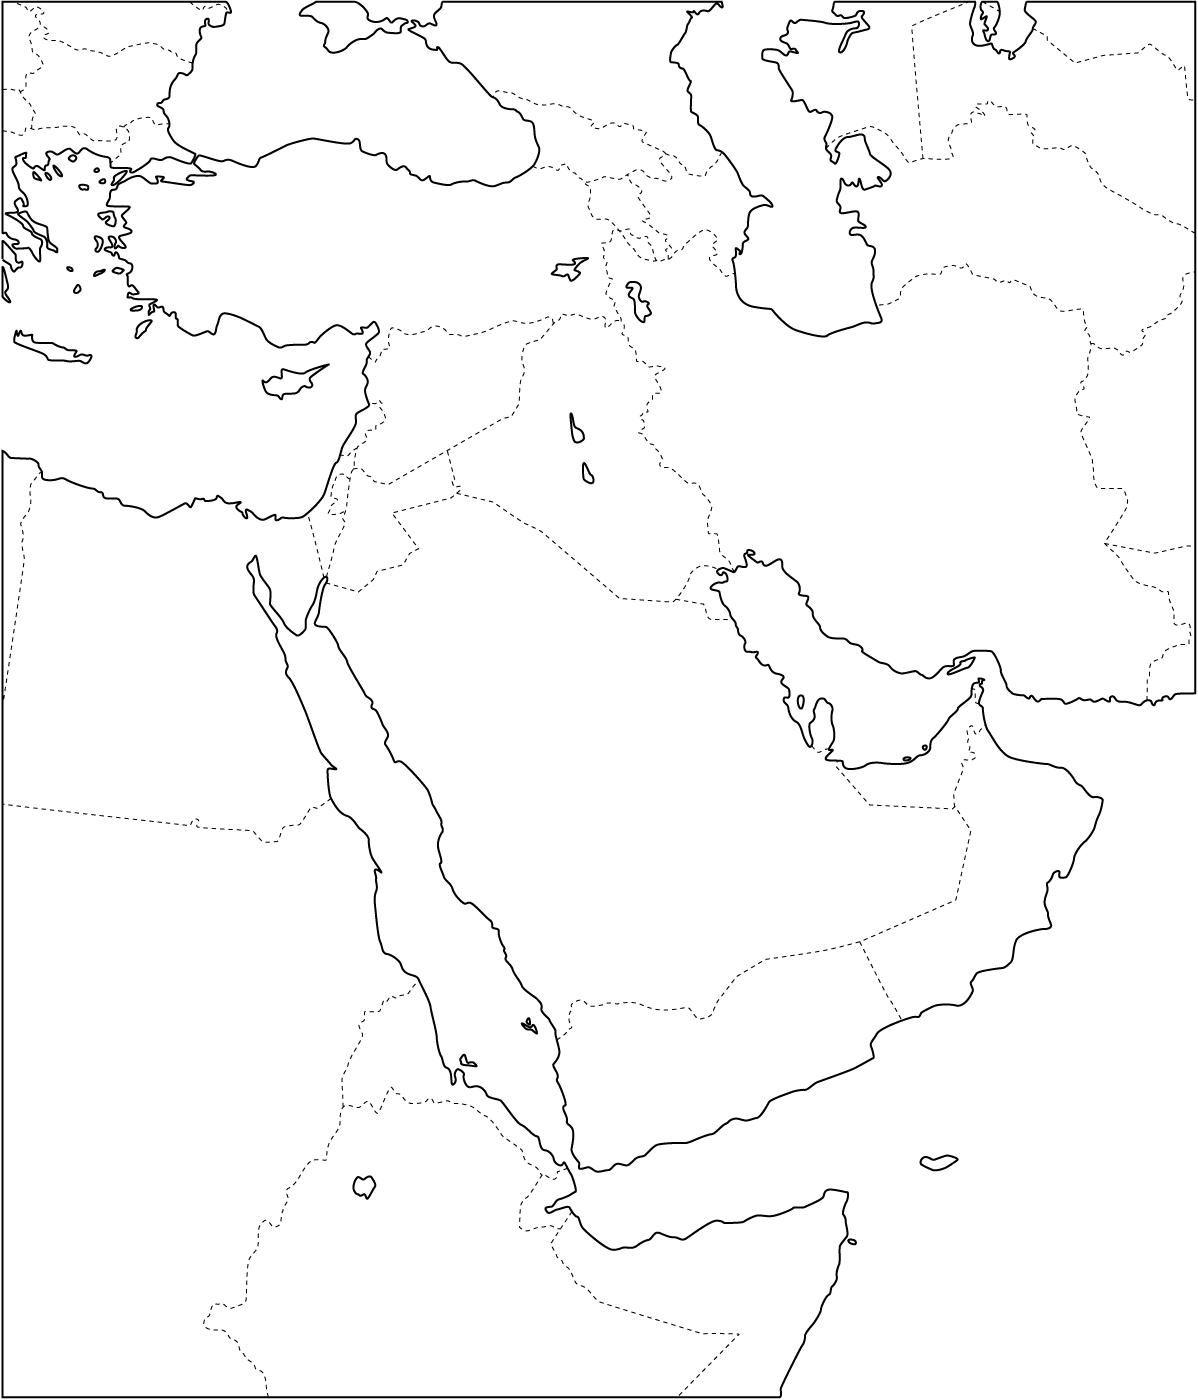 Mapa De Paises De Oriente Medio Freemap Mapa Paises Mapas